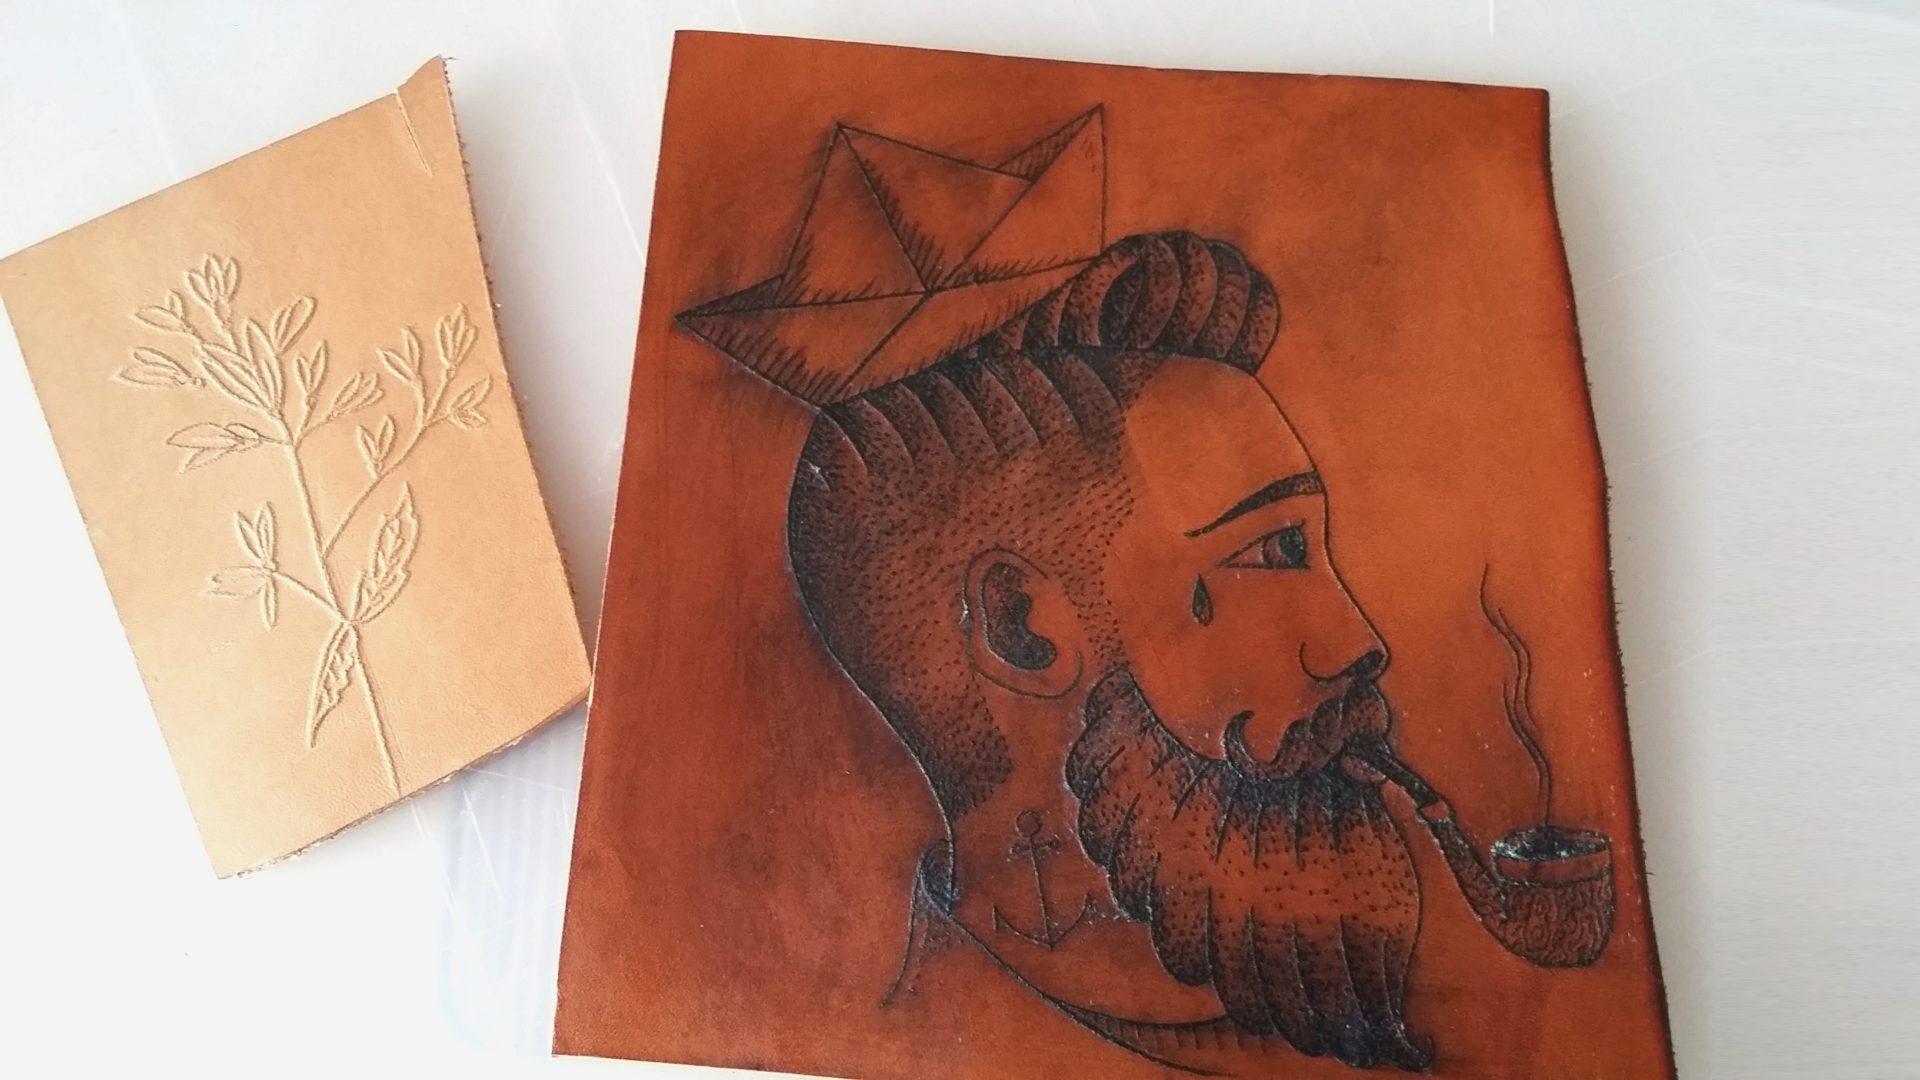 sac-bois-cuir-damien-beal-colalboration-tatouage-artisan-tatoueur